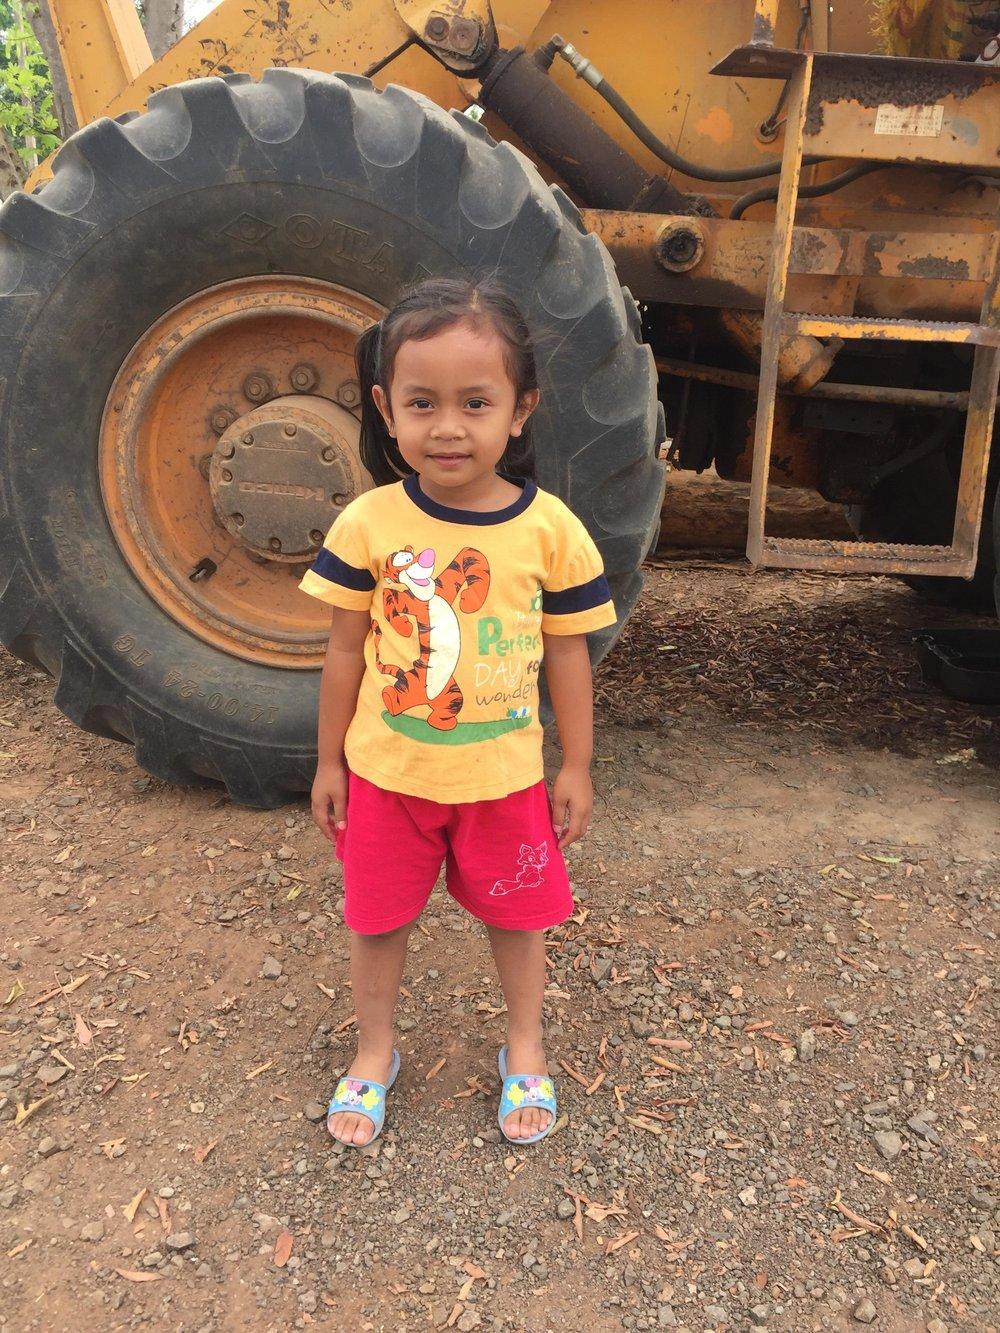 Chulida Teimmareang (lita) (4 years old, girl)